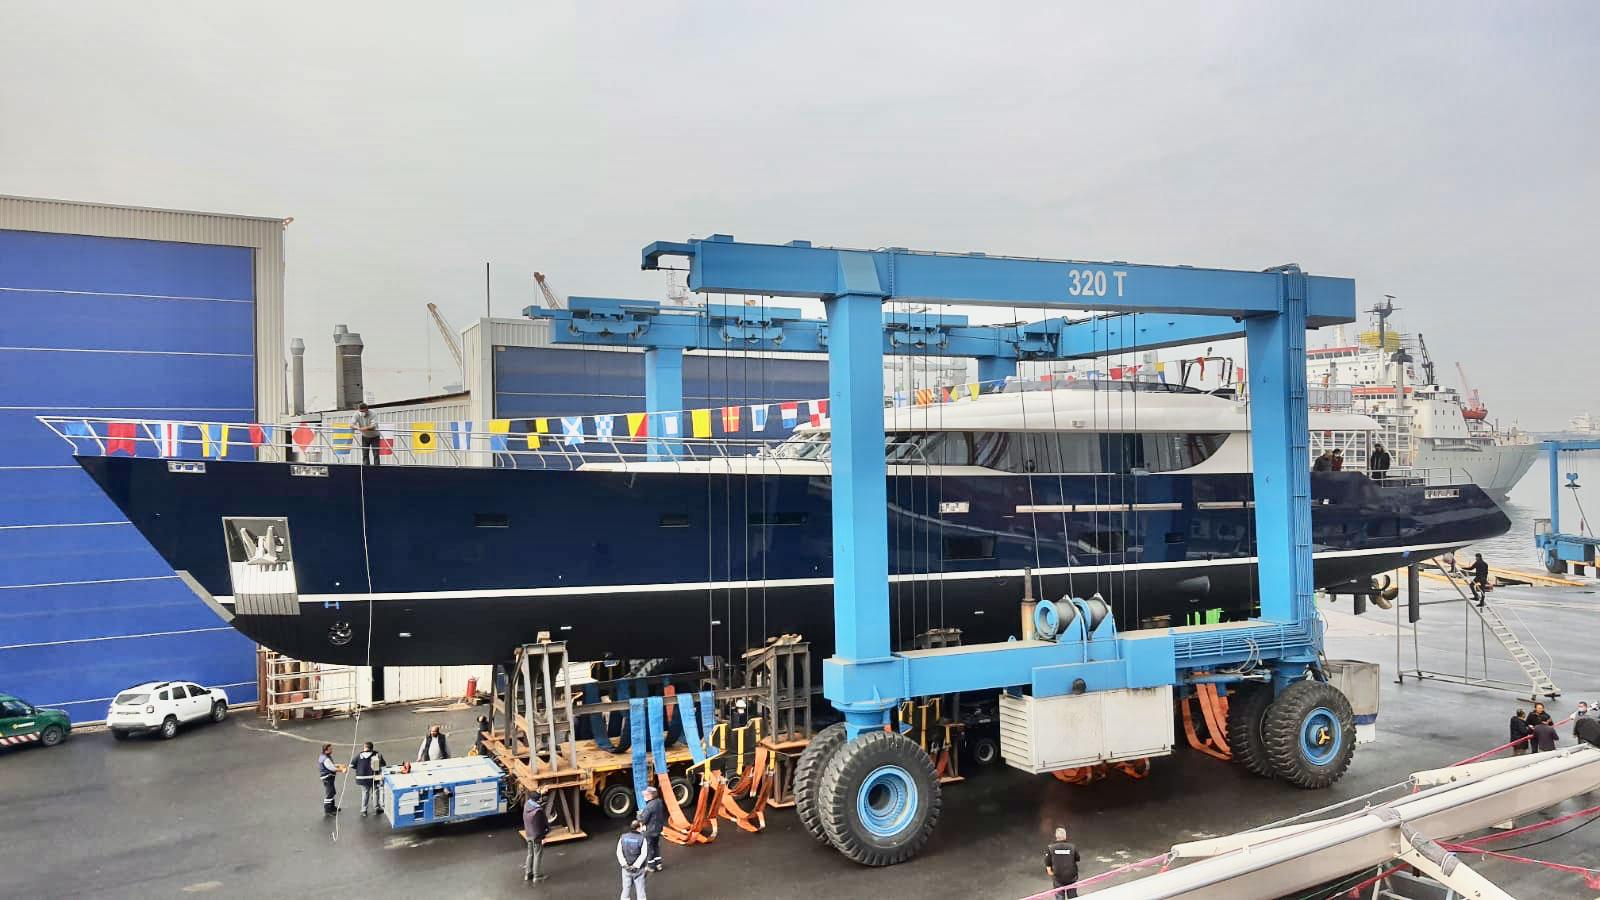 L'Aquila II superyacht launched © Mengi Yay